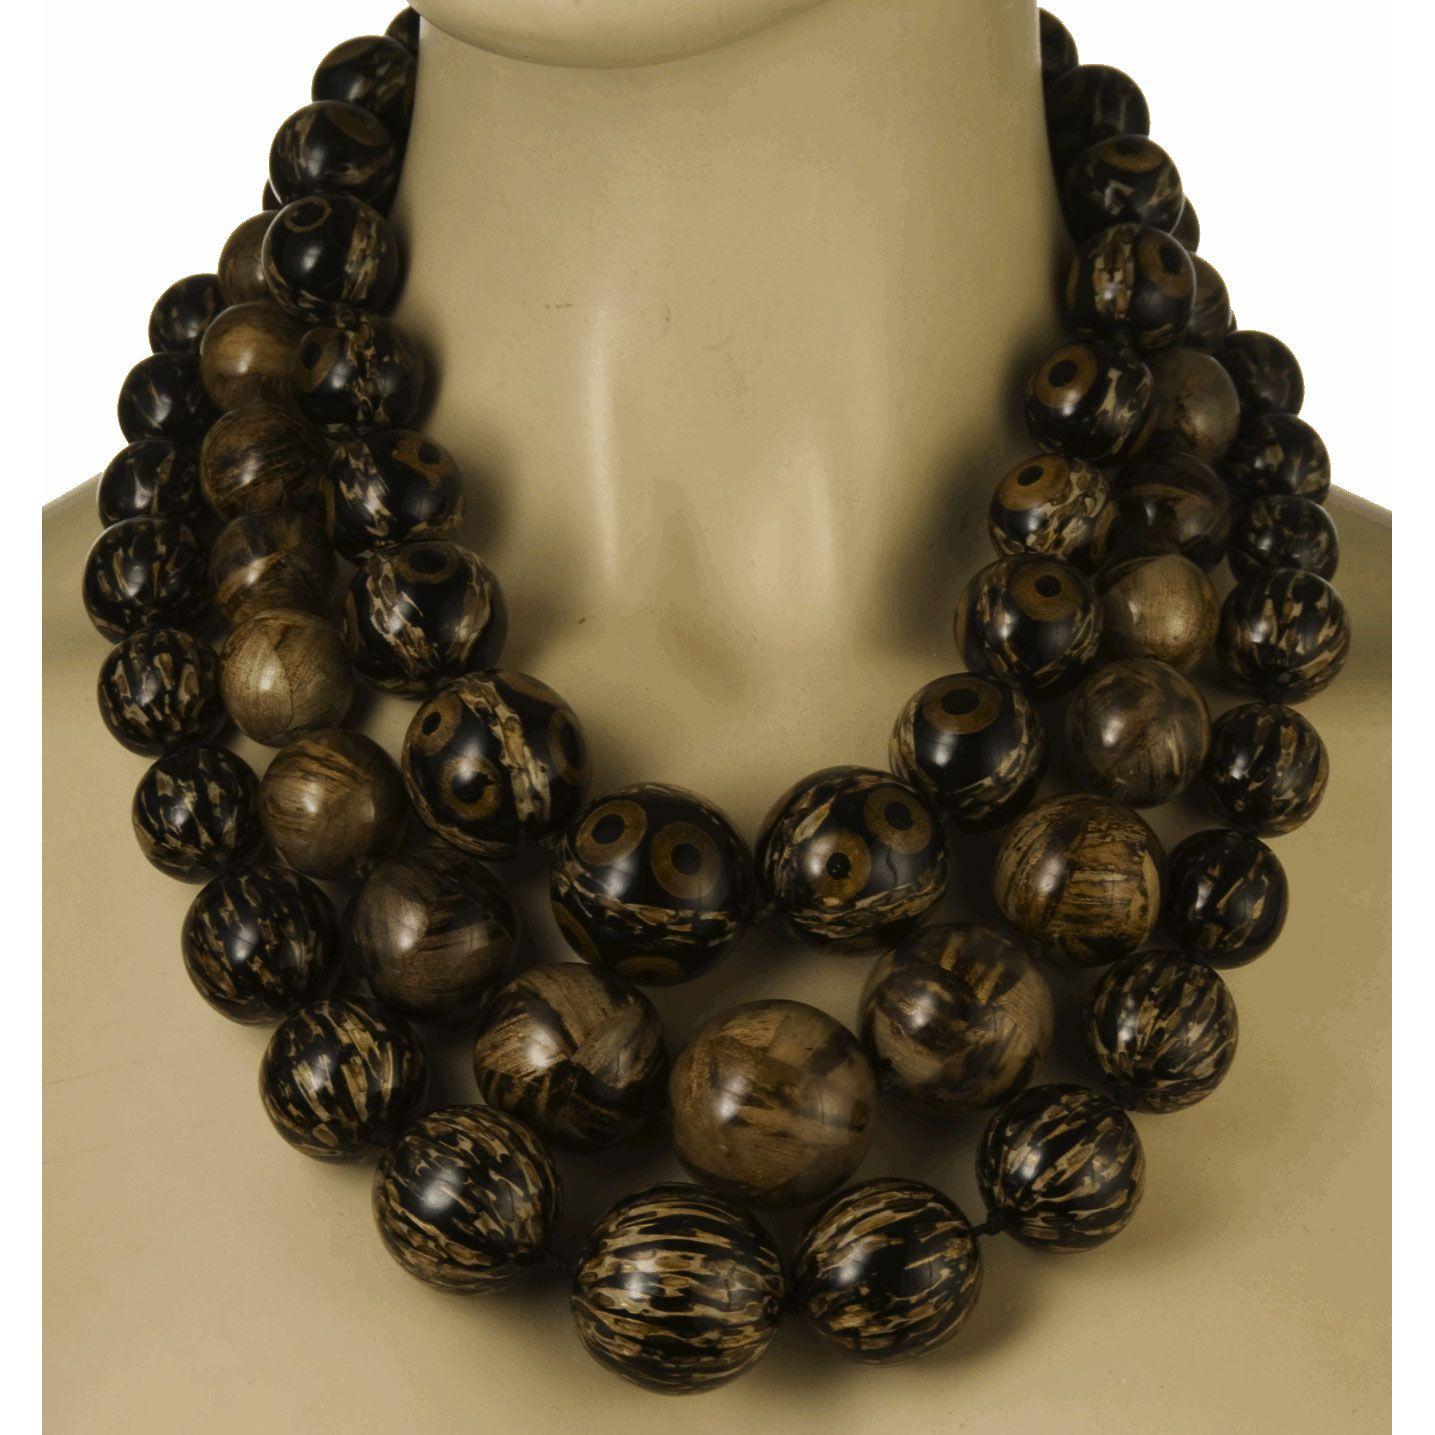 iris apfel jewelry collection